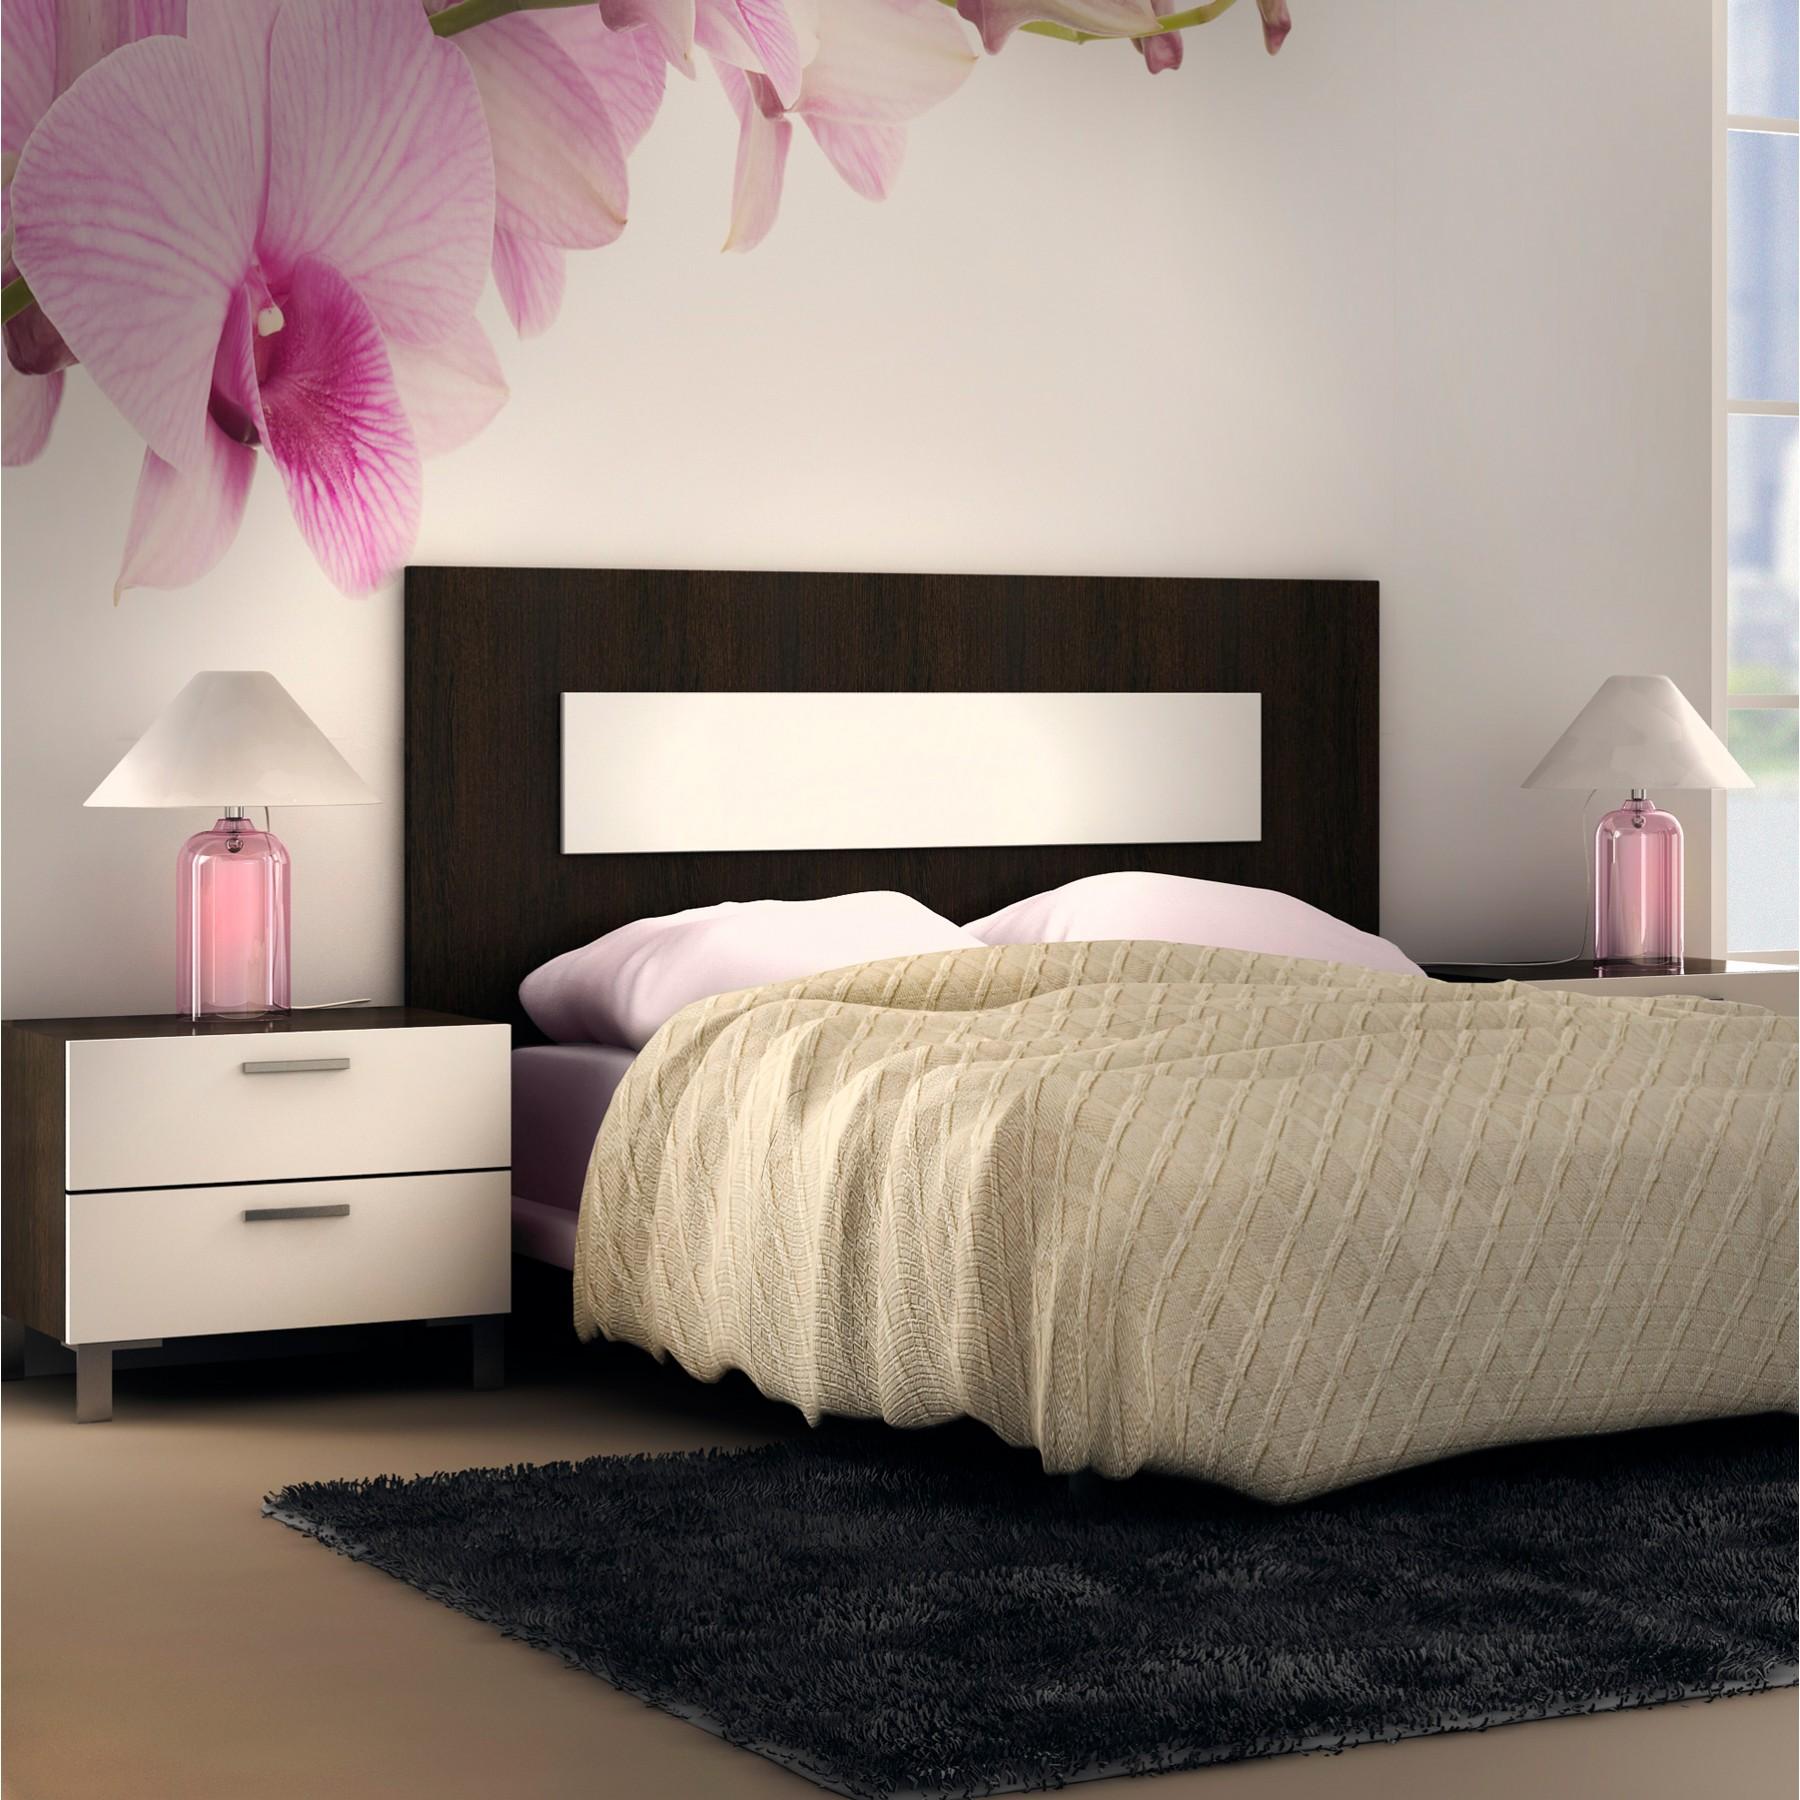 Cabecero de cama moderno en madera blog dekogar - Cabeceros de cama de diseno ...